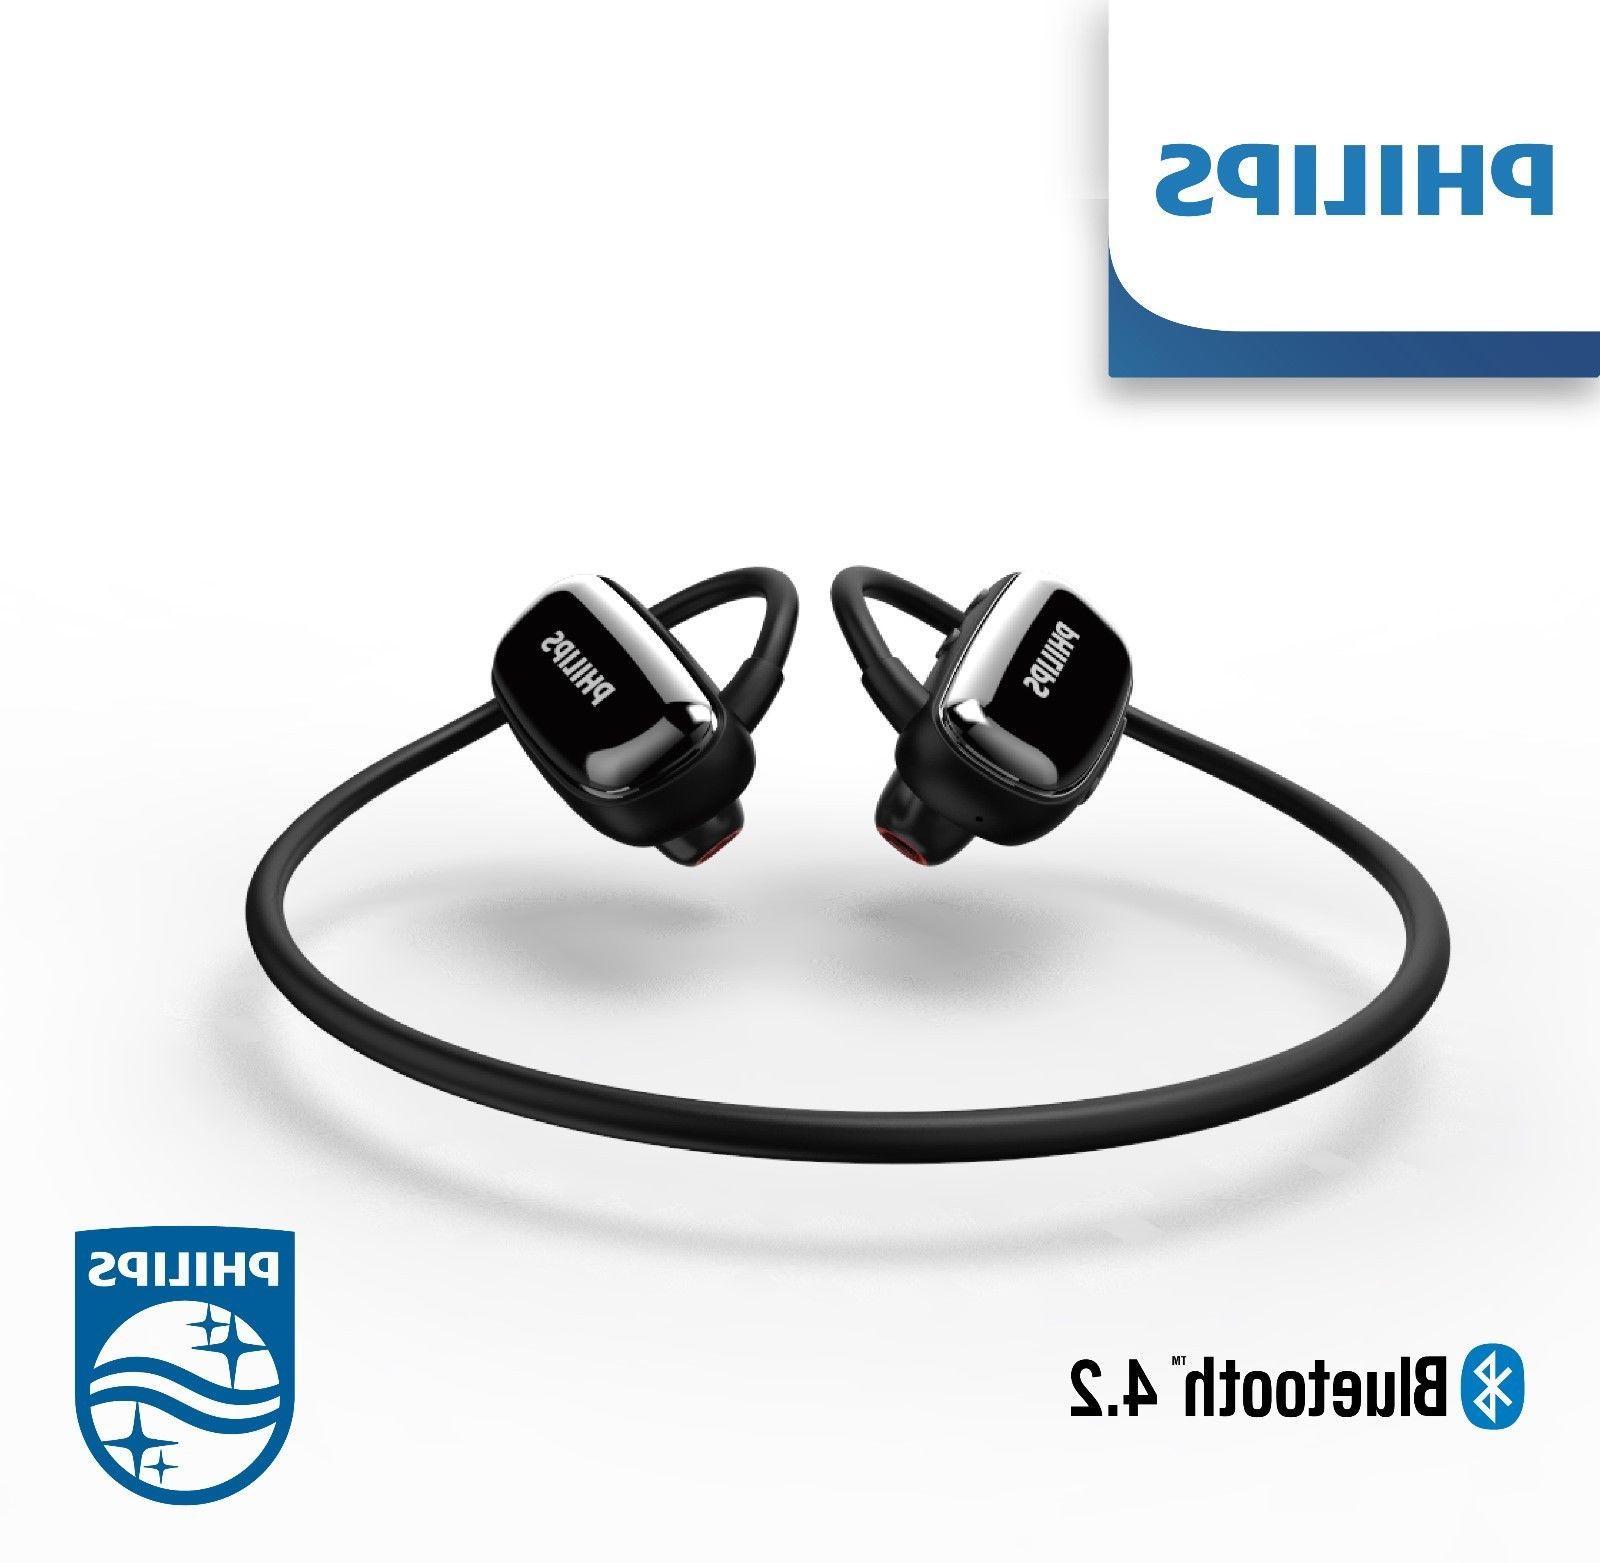 Philips headset MP3 player SA6608 Waterproof 8GB Digital mus